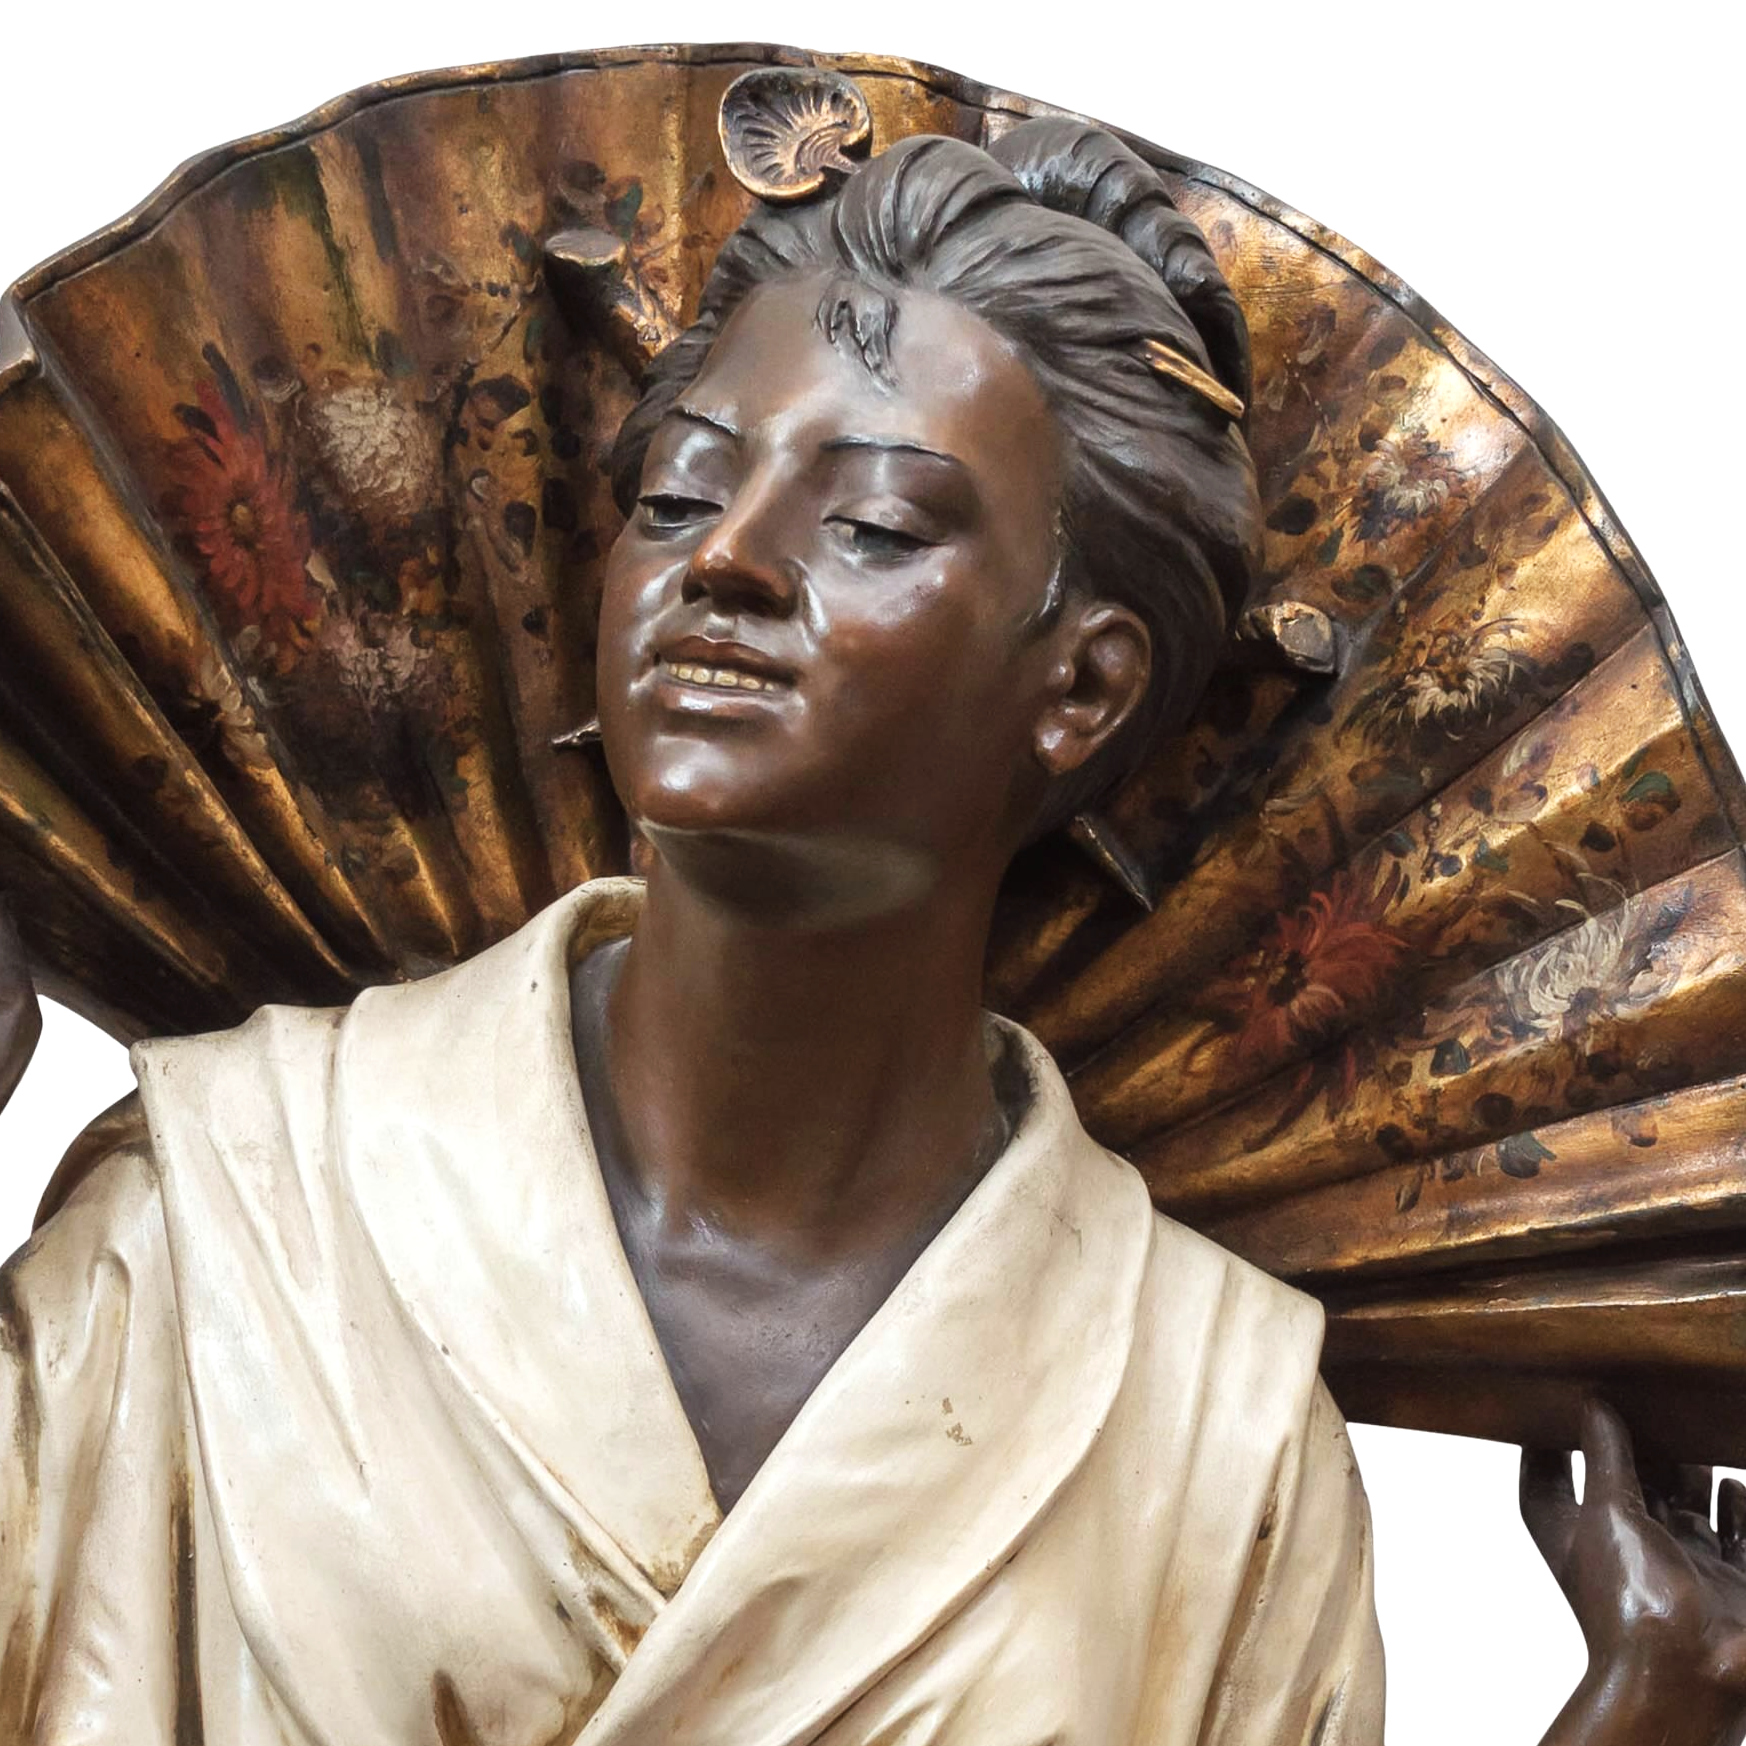 Polychromed terracotta bust by Gustav Koenig Monartsgallery